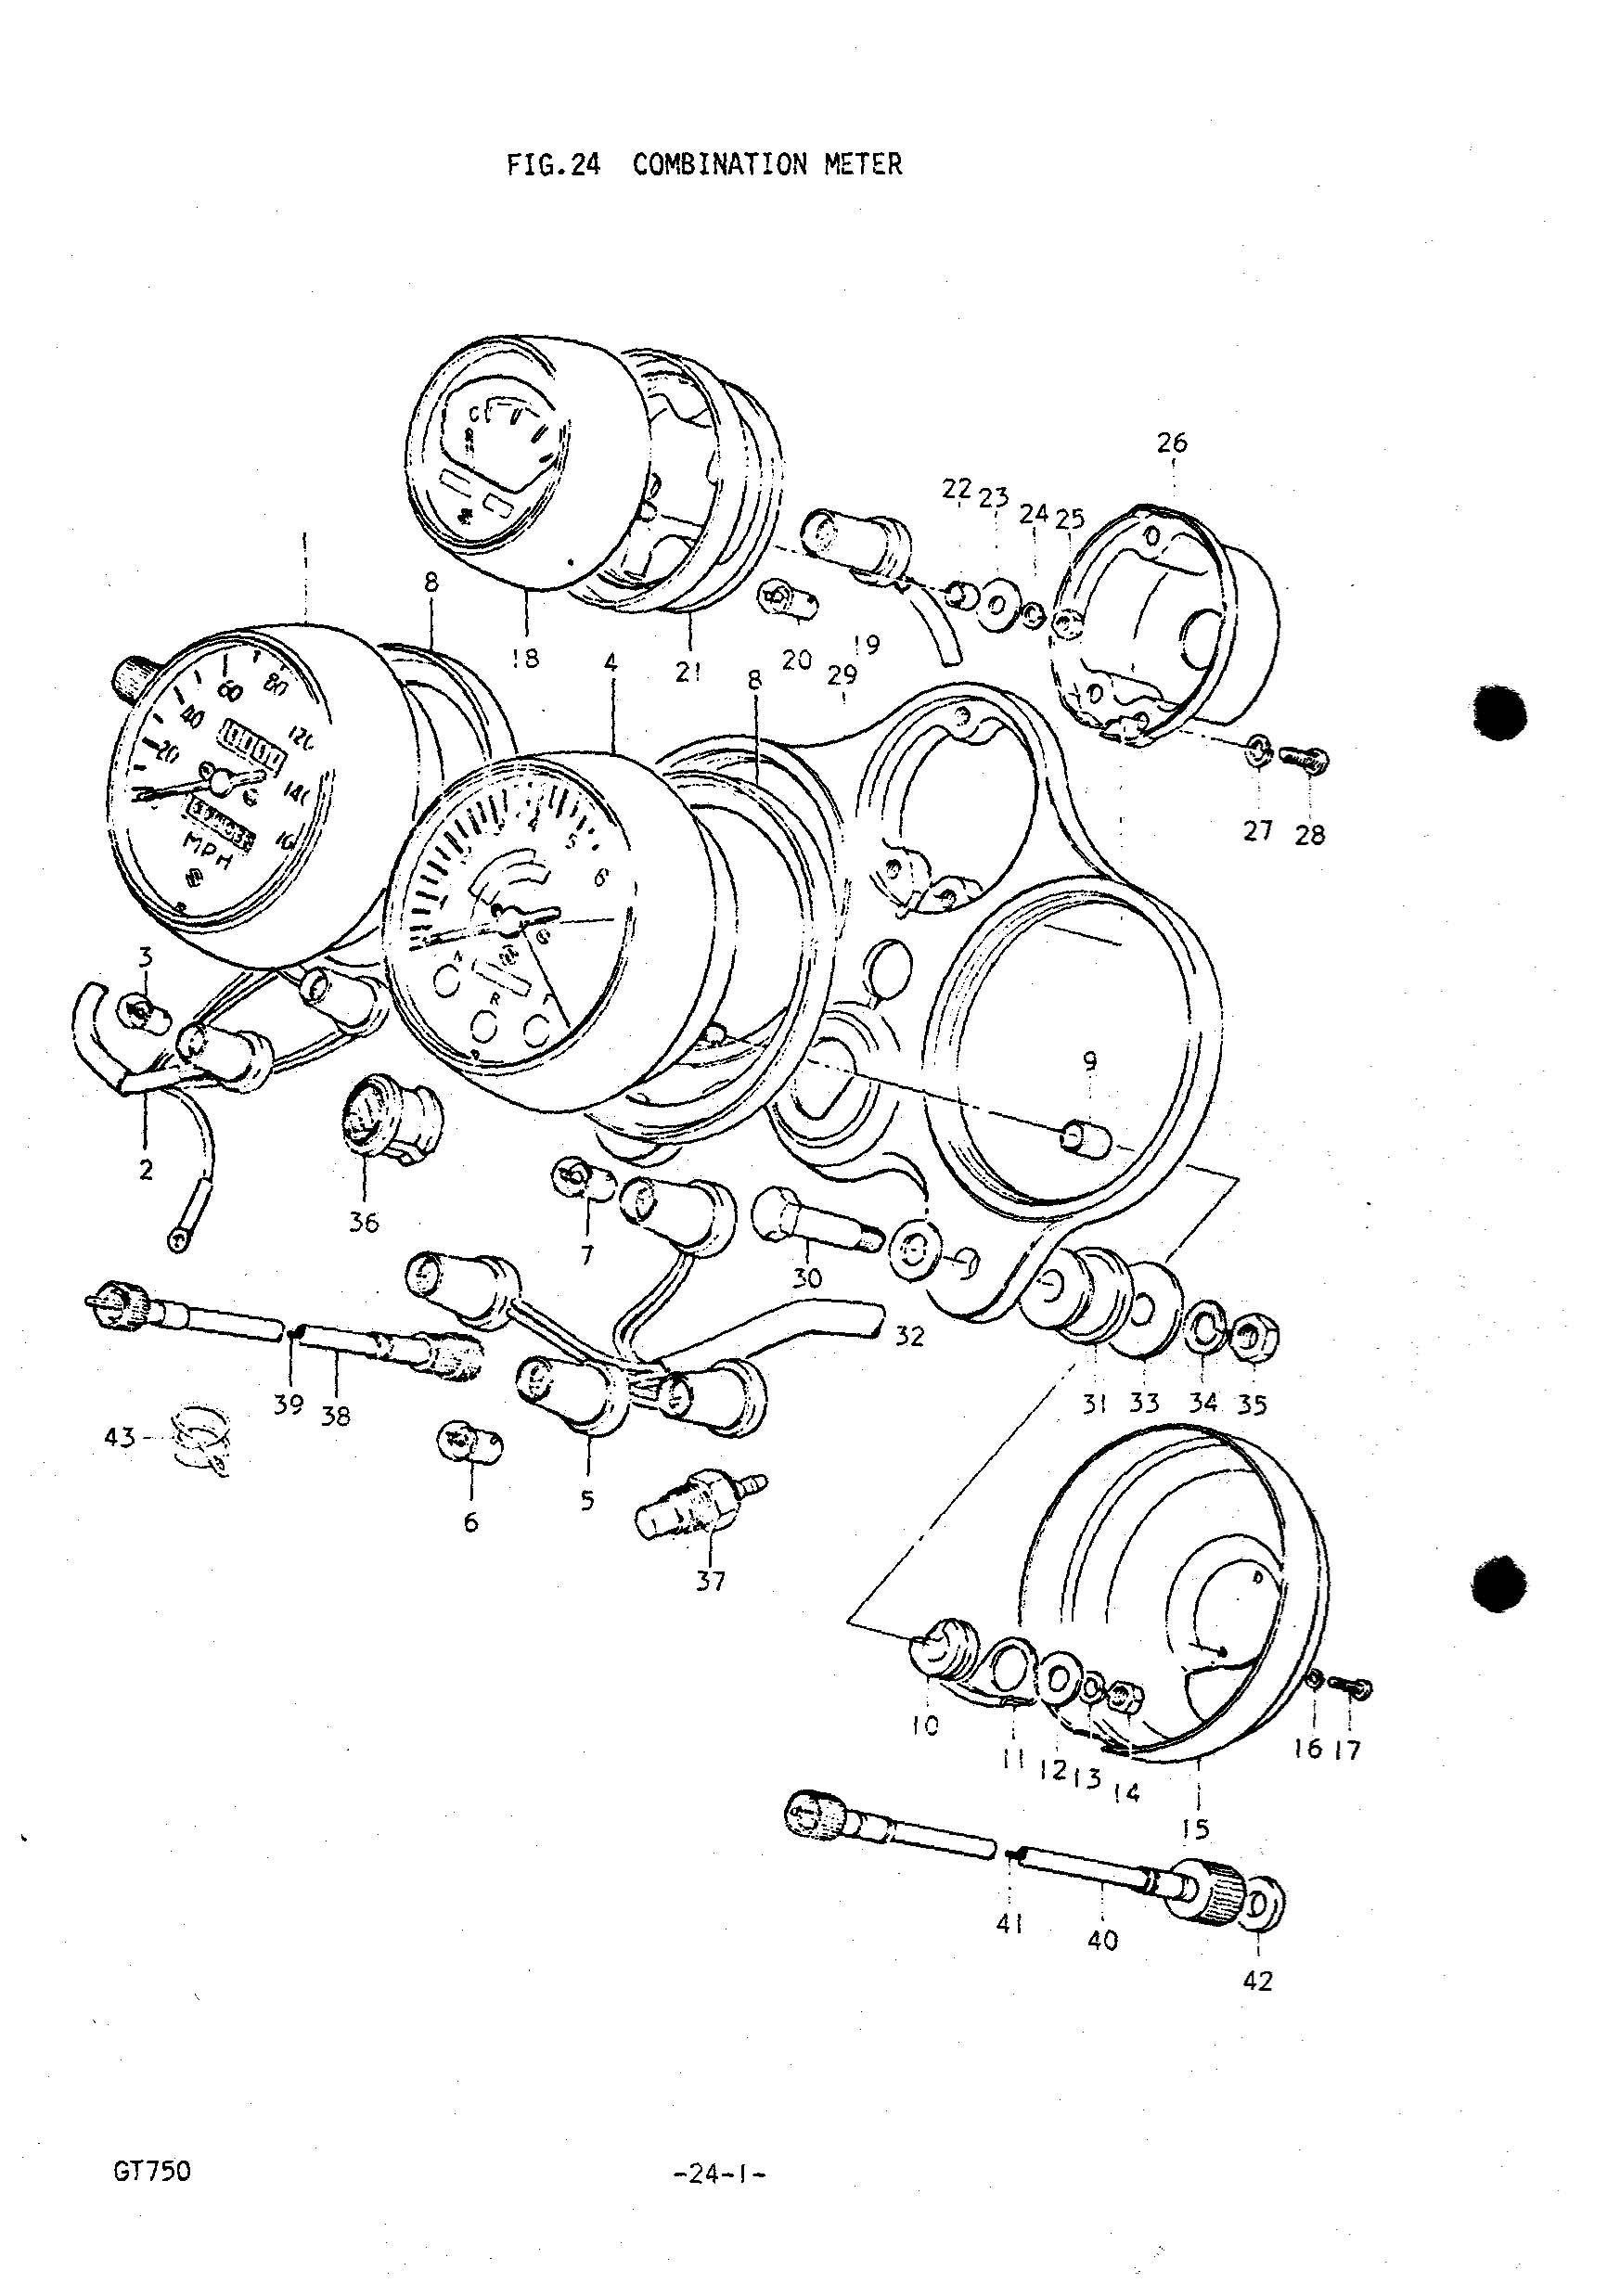 Tachometer Drawing At Getdrawings